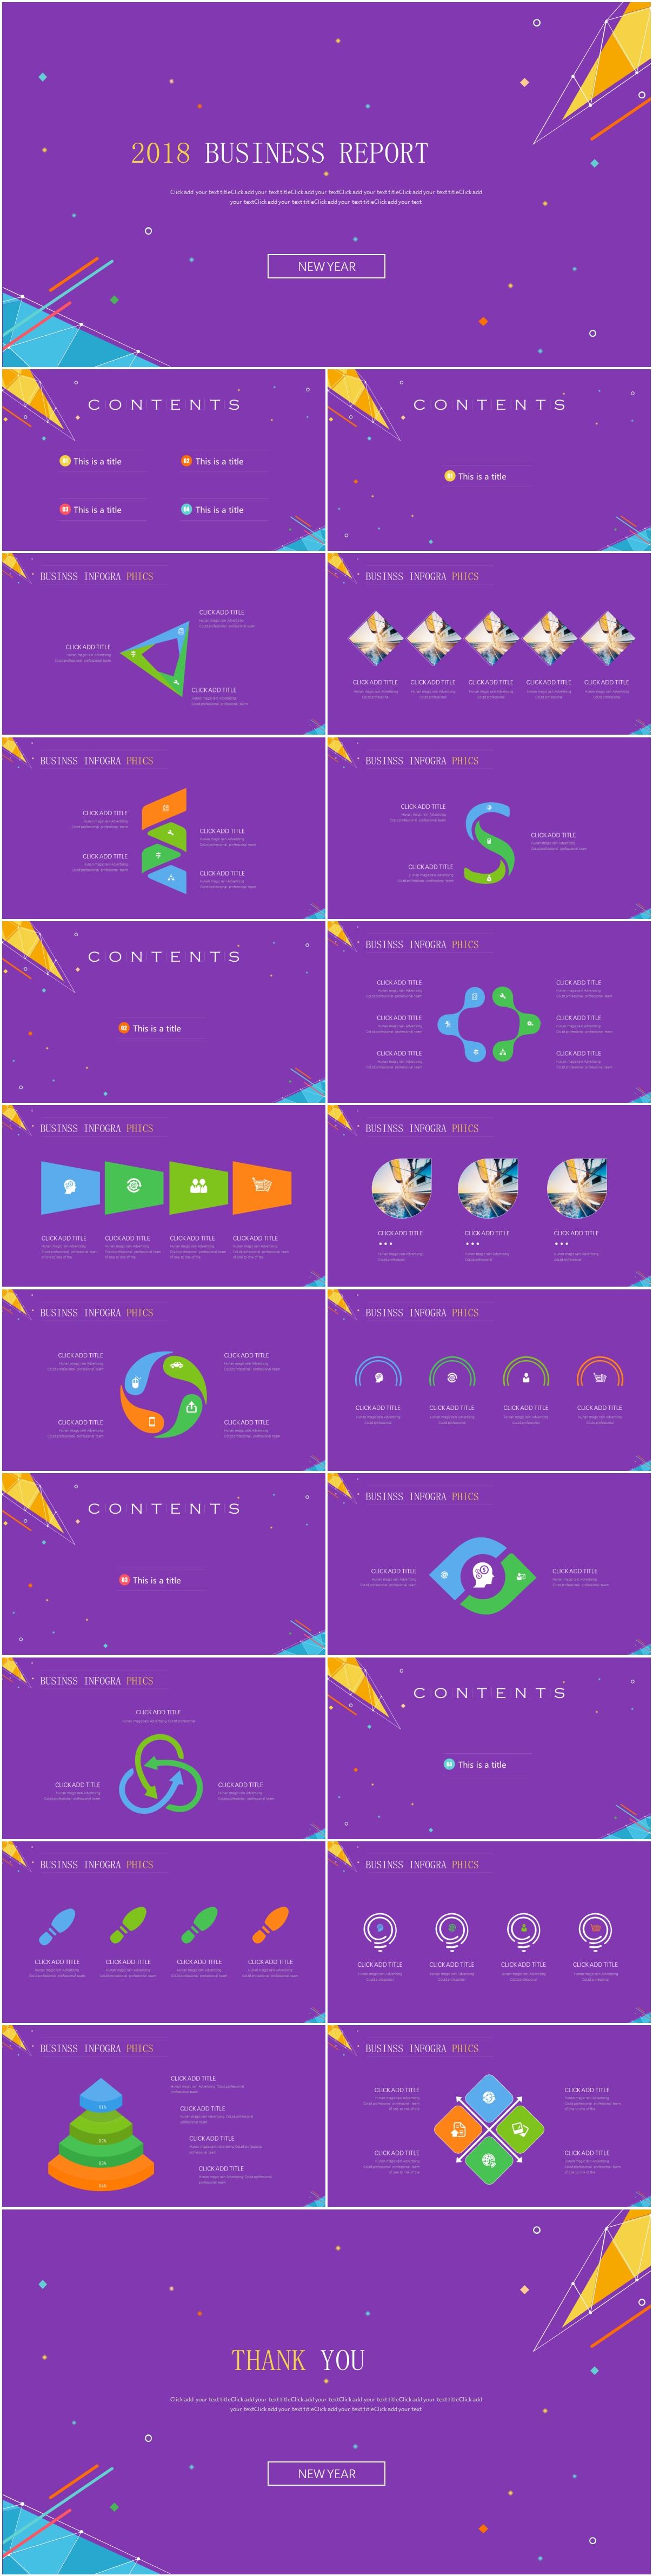 modern purple flat presentation template - Modern Purple Flat Presentation Template - purple, modern, flat, business report, business presentation template